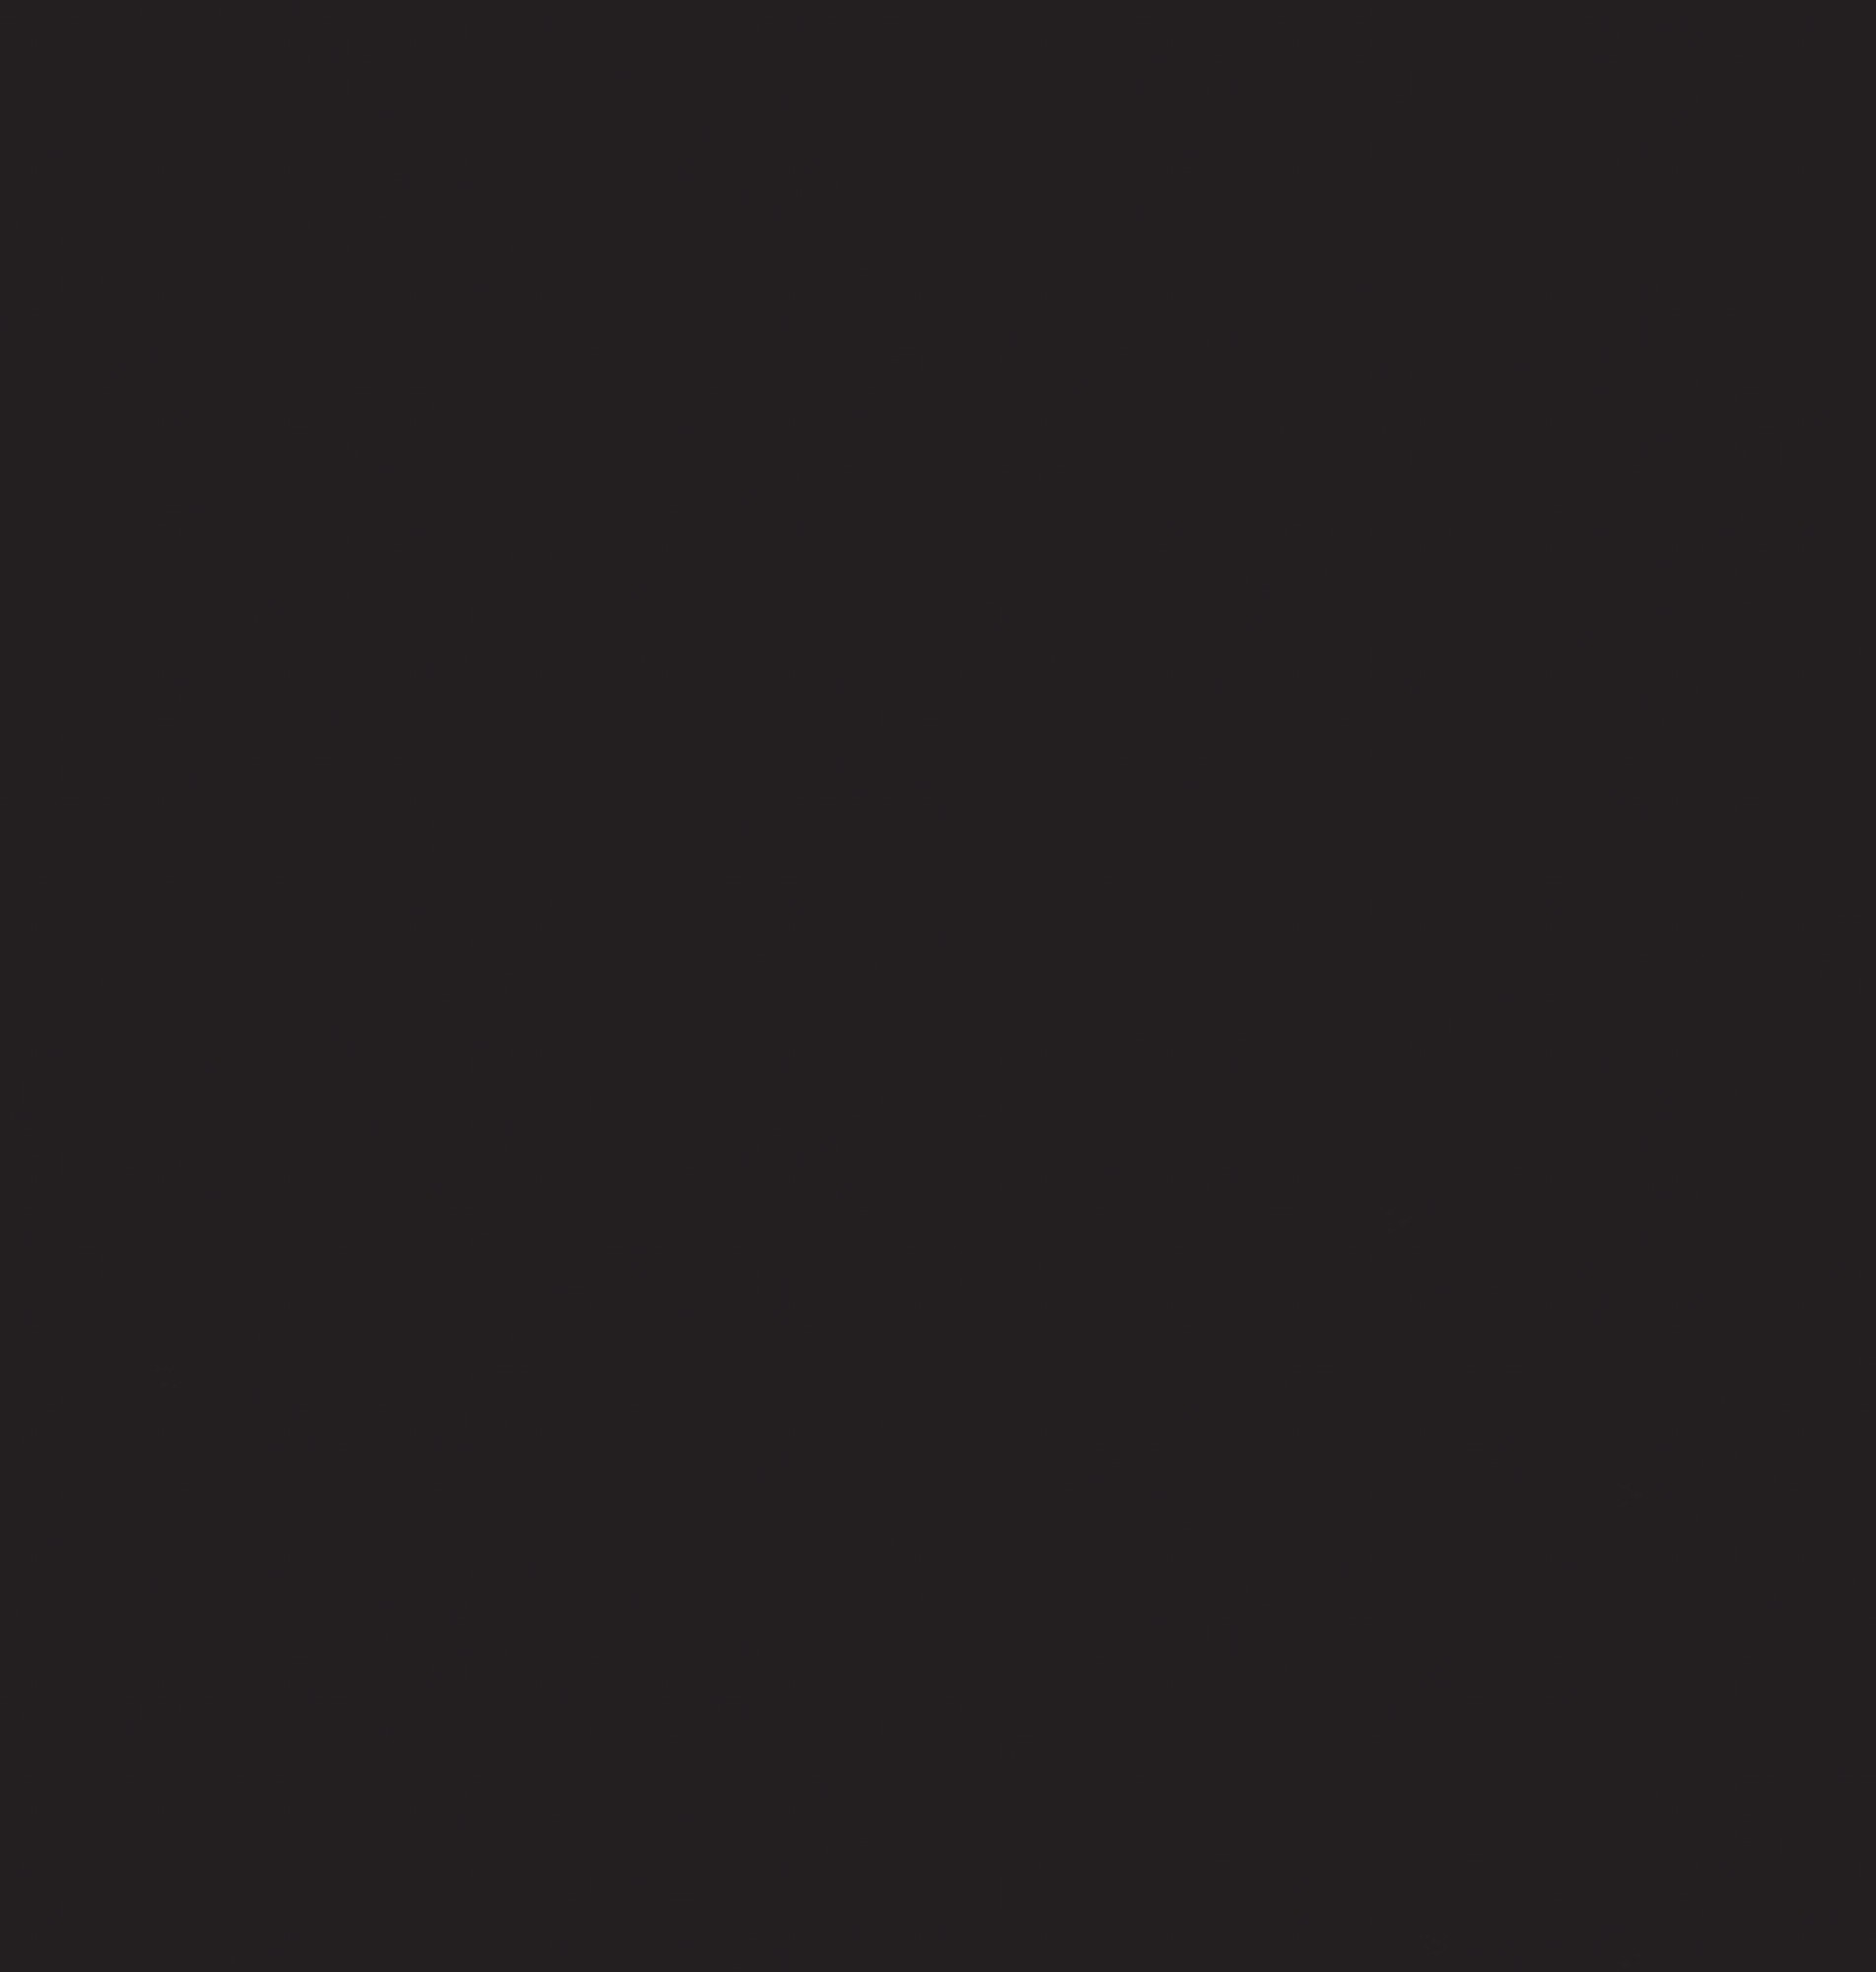 Tecido Tricoline Preto 100% Algodao 1,50 m Largura